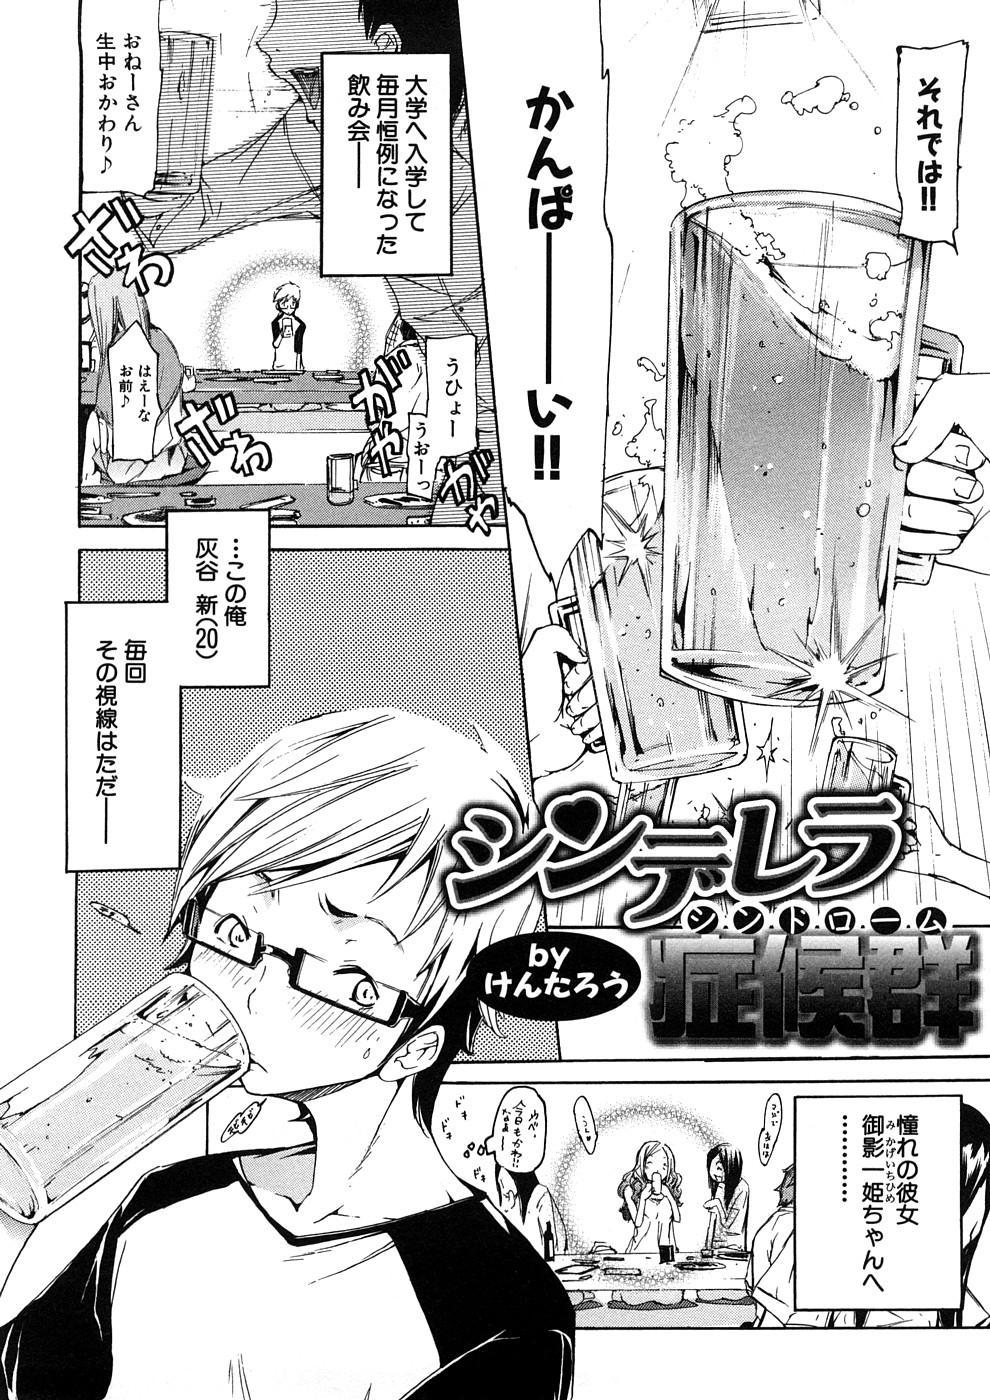 Geki Yaba Anthology Vol. 1 - Naka ni Dashite yo 28